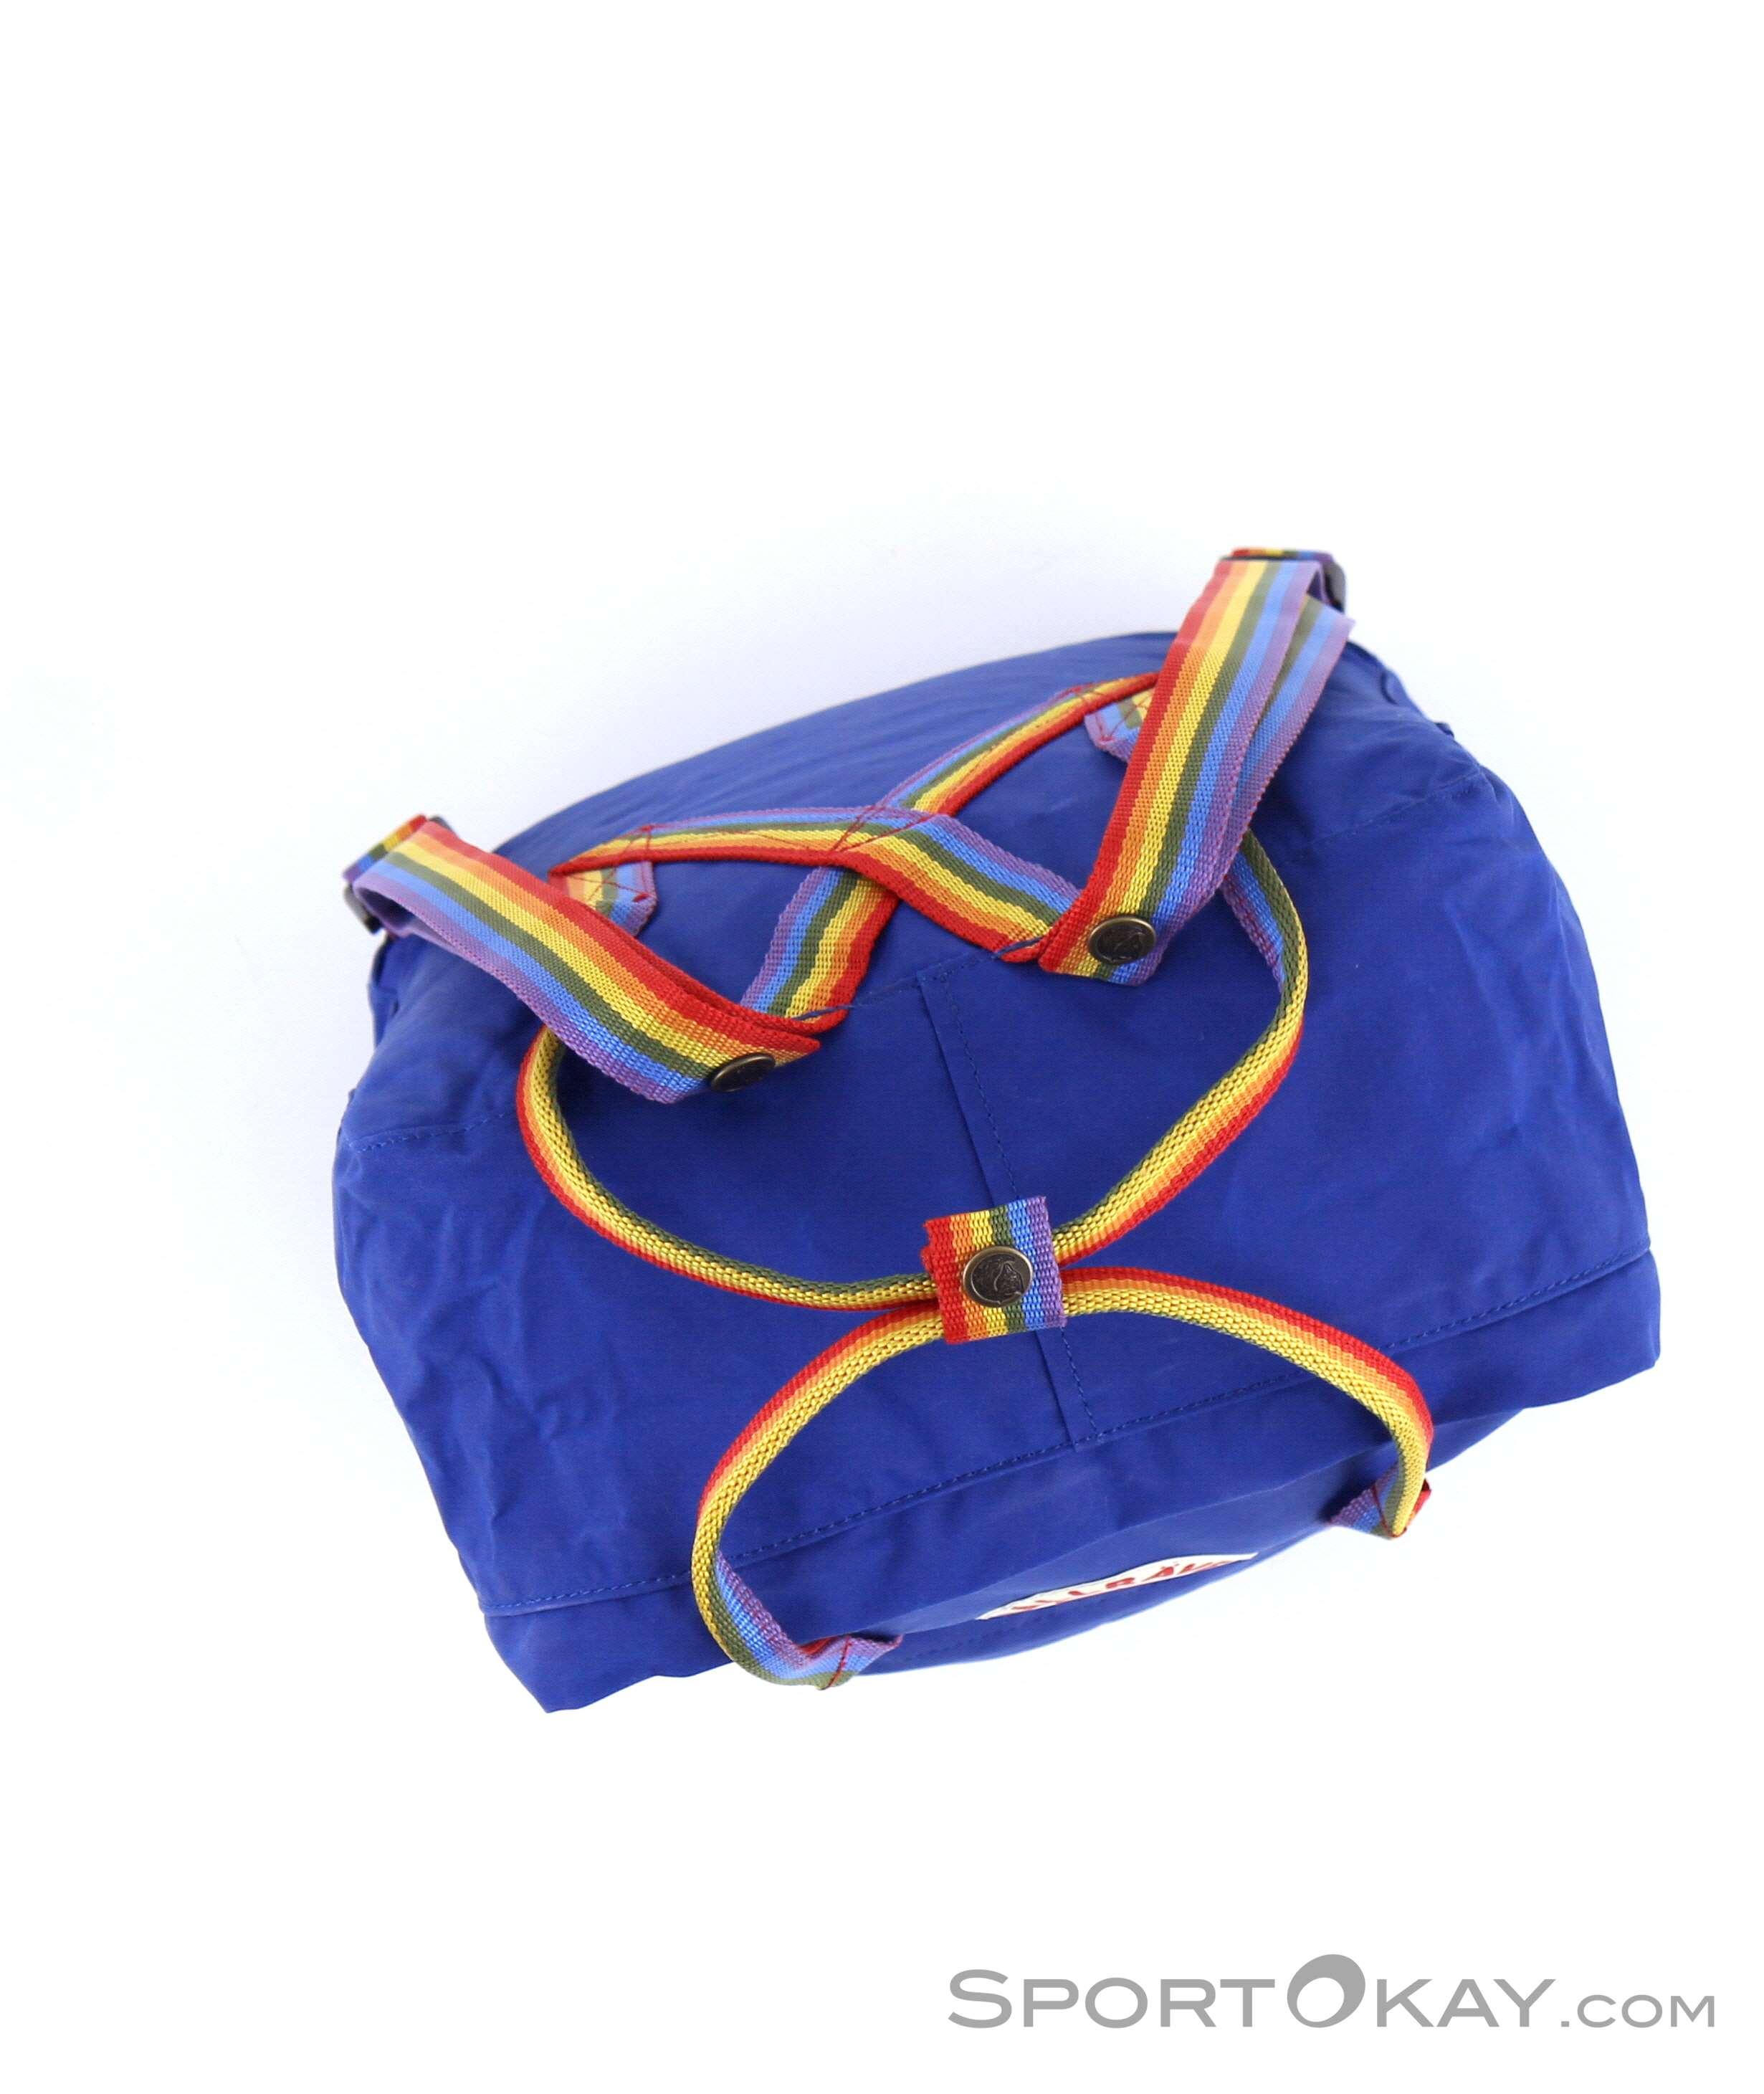 02a0c17cc8 Fjällräven Kanken Rainbow 16l Backpack - Bags - Leisure Bags ...